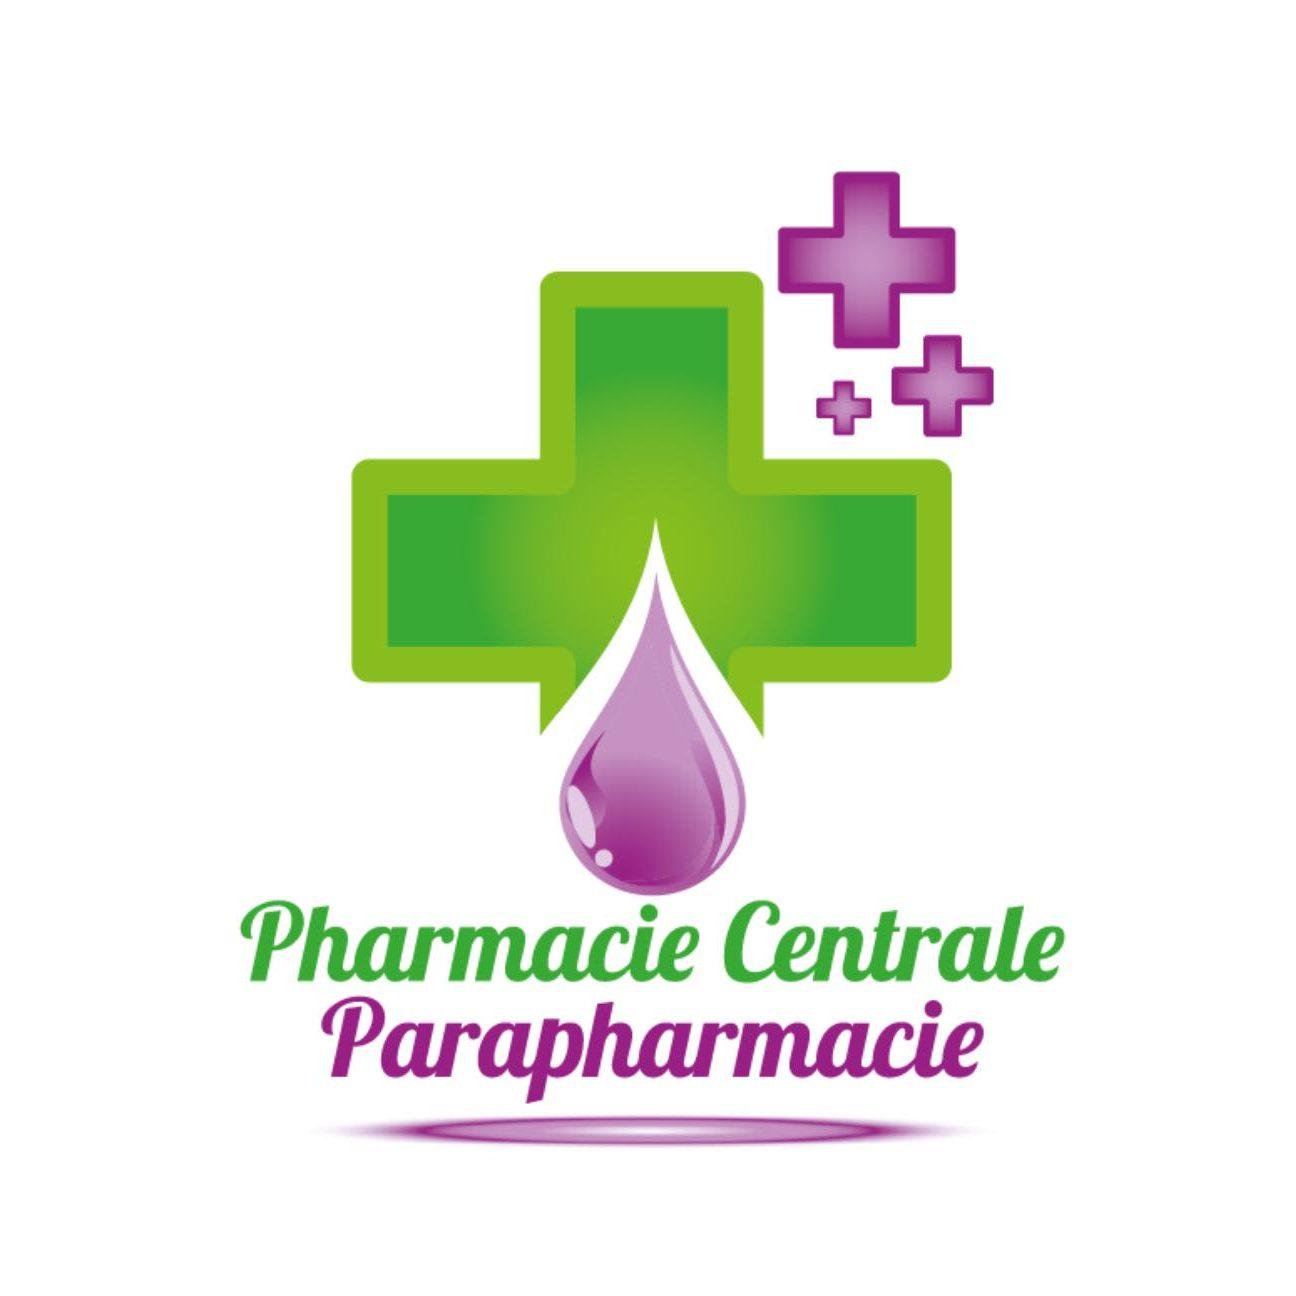 Pharmacie Centrale Courbevoie